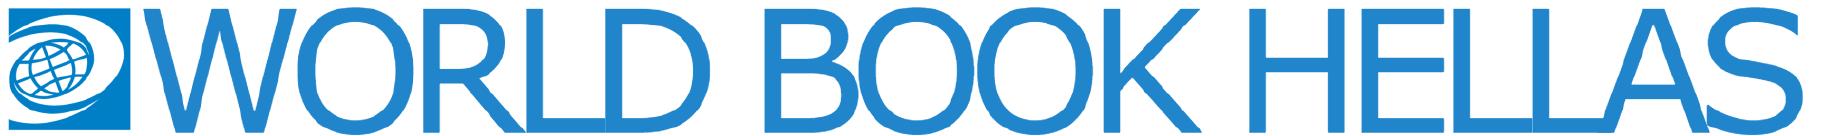 World Book Hellas logo